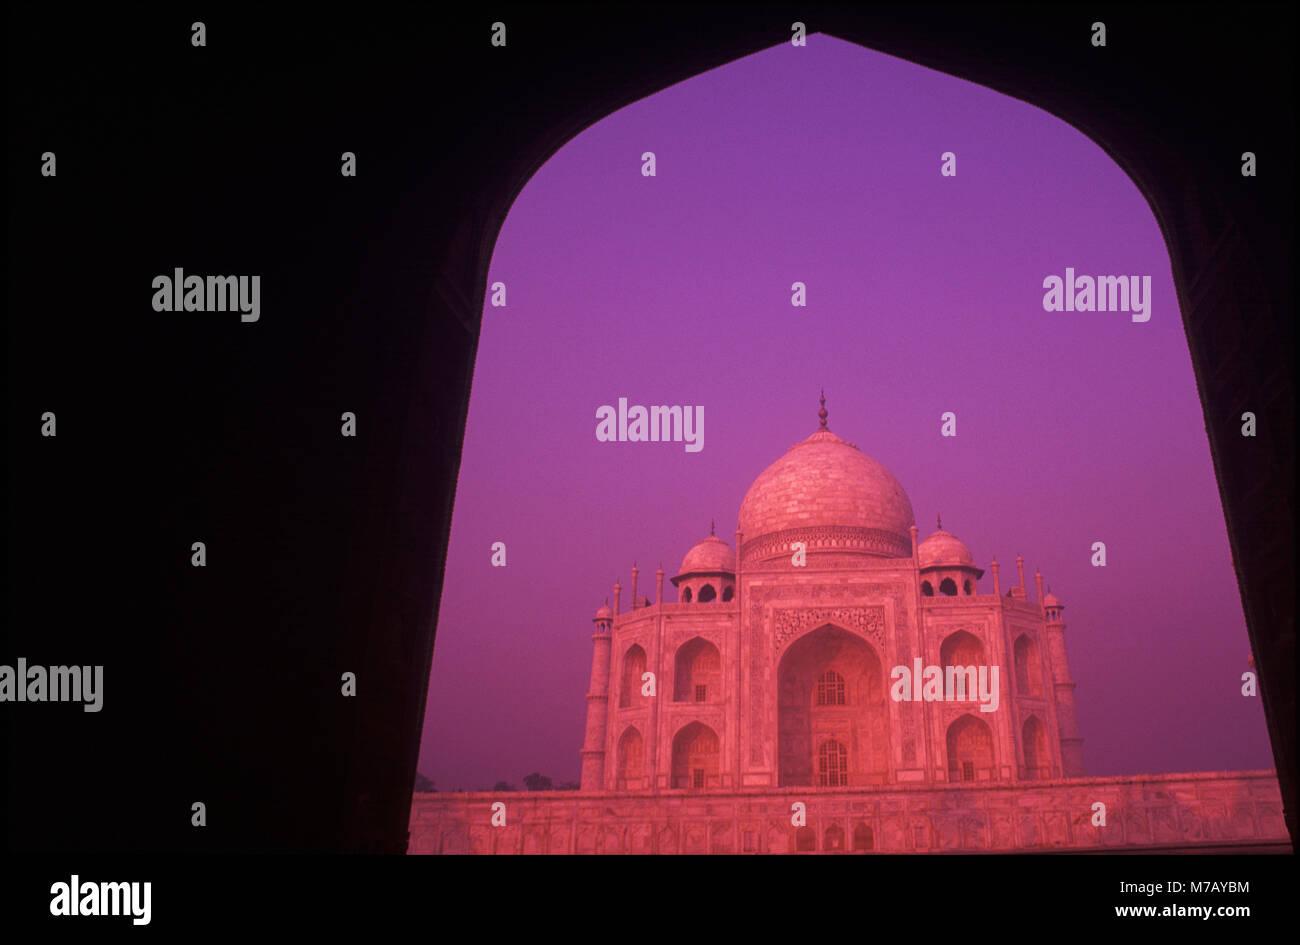 Fassade des ein Denkmal, Taj Mahal, Agra, Uttar Pradesh, Indien Stockbild